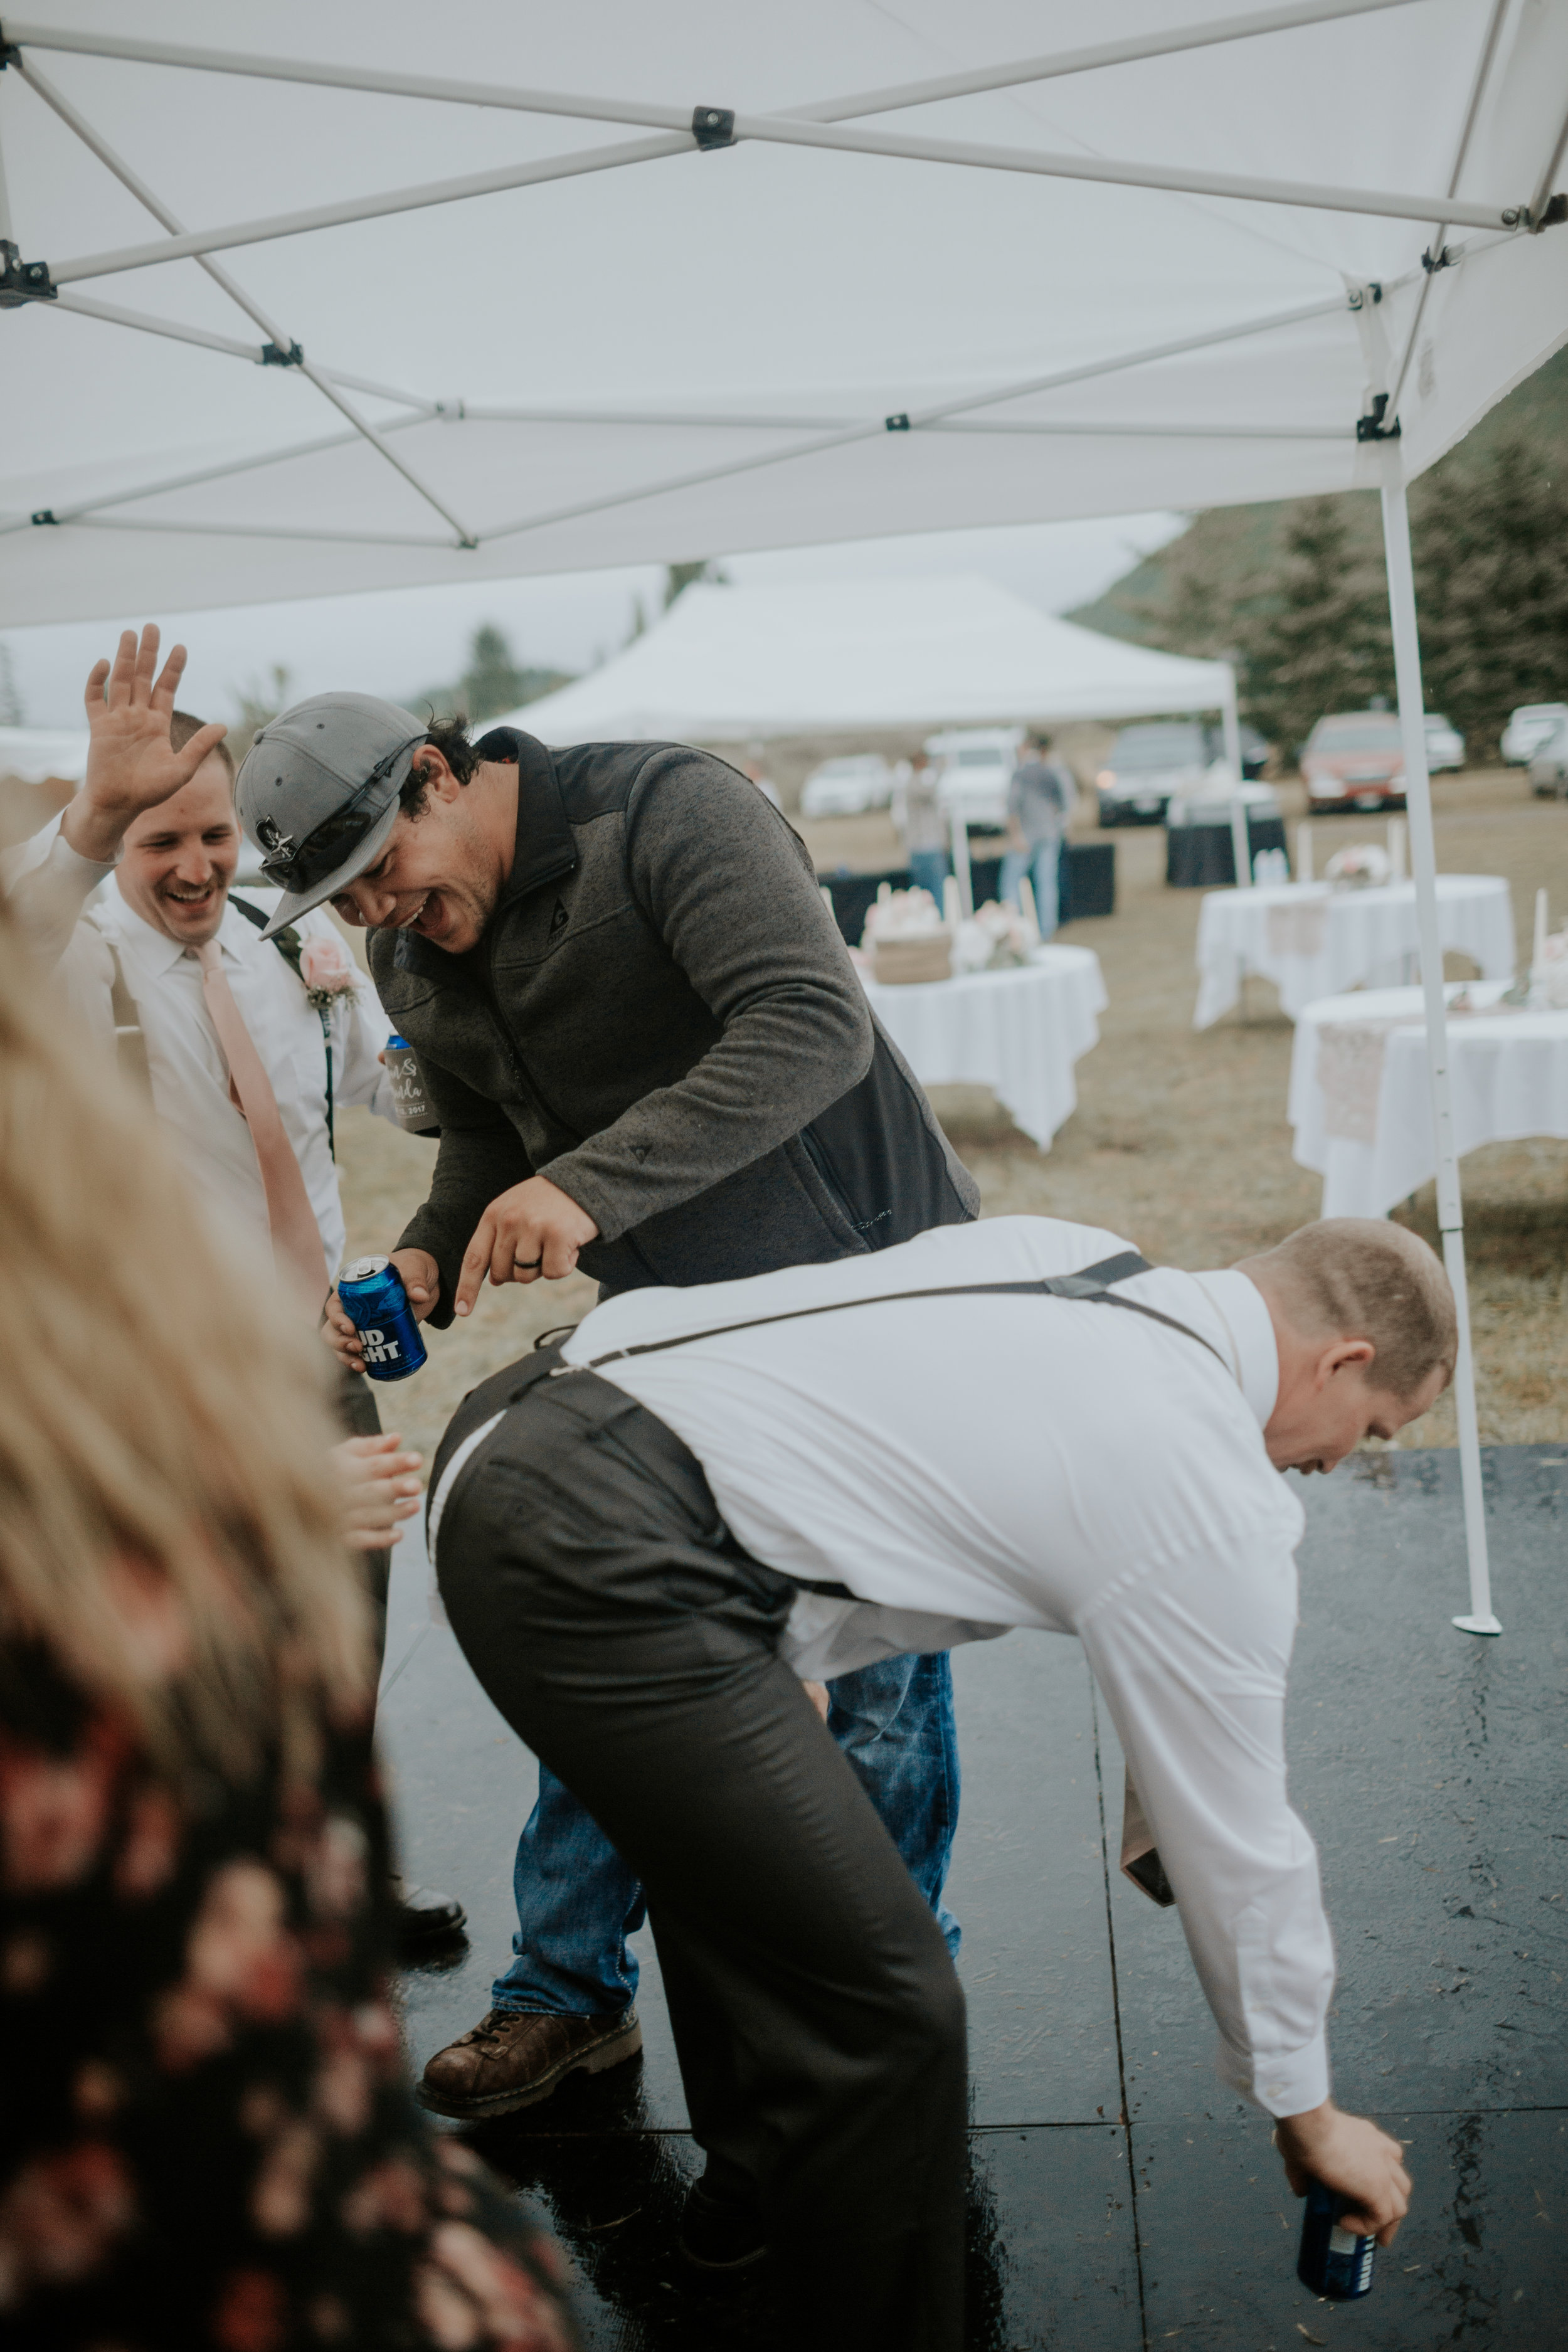 Olympic-Peninsula-Wedding-Photographer-PNW-Forks-Port-Angeles-Kayla-Dawn-Photography-engagement-Olympic-National-Park-204.jpg